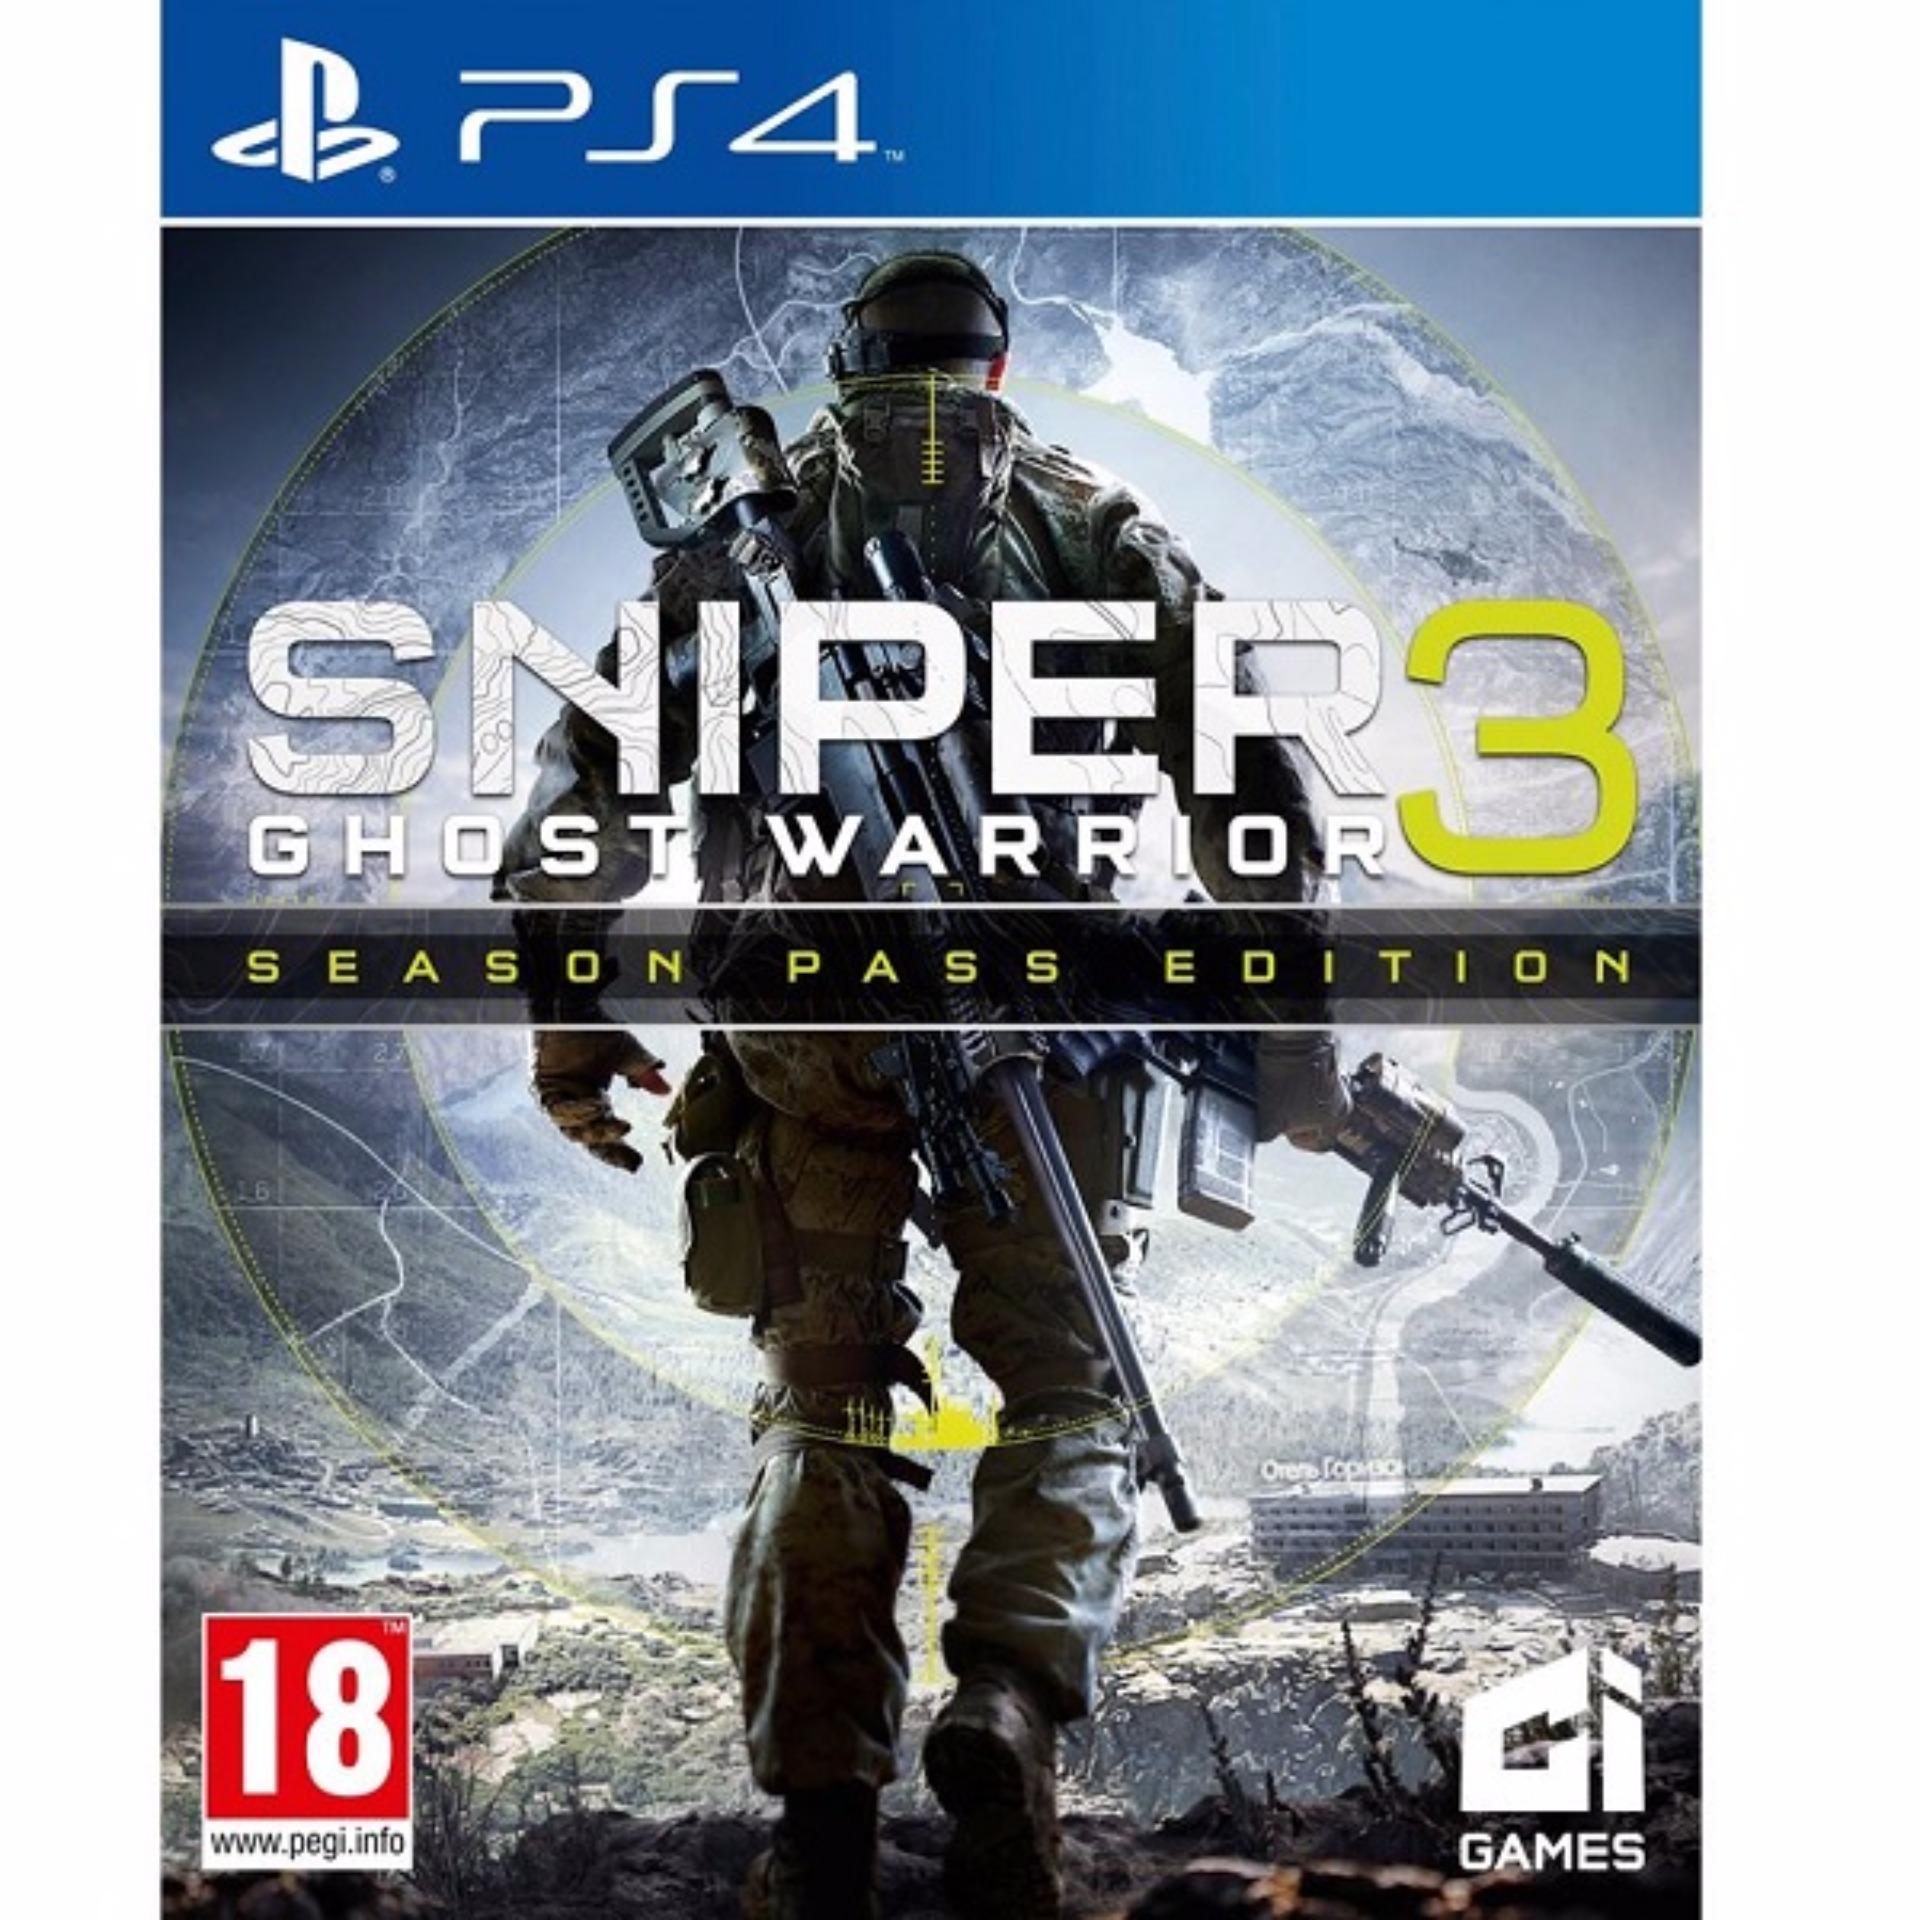 PS4 Sniper Ghost Warrior 3